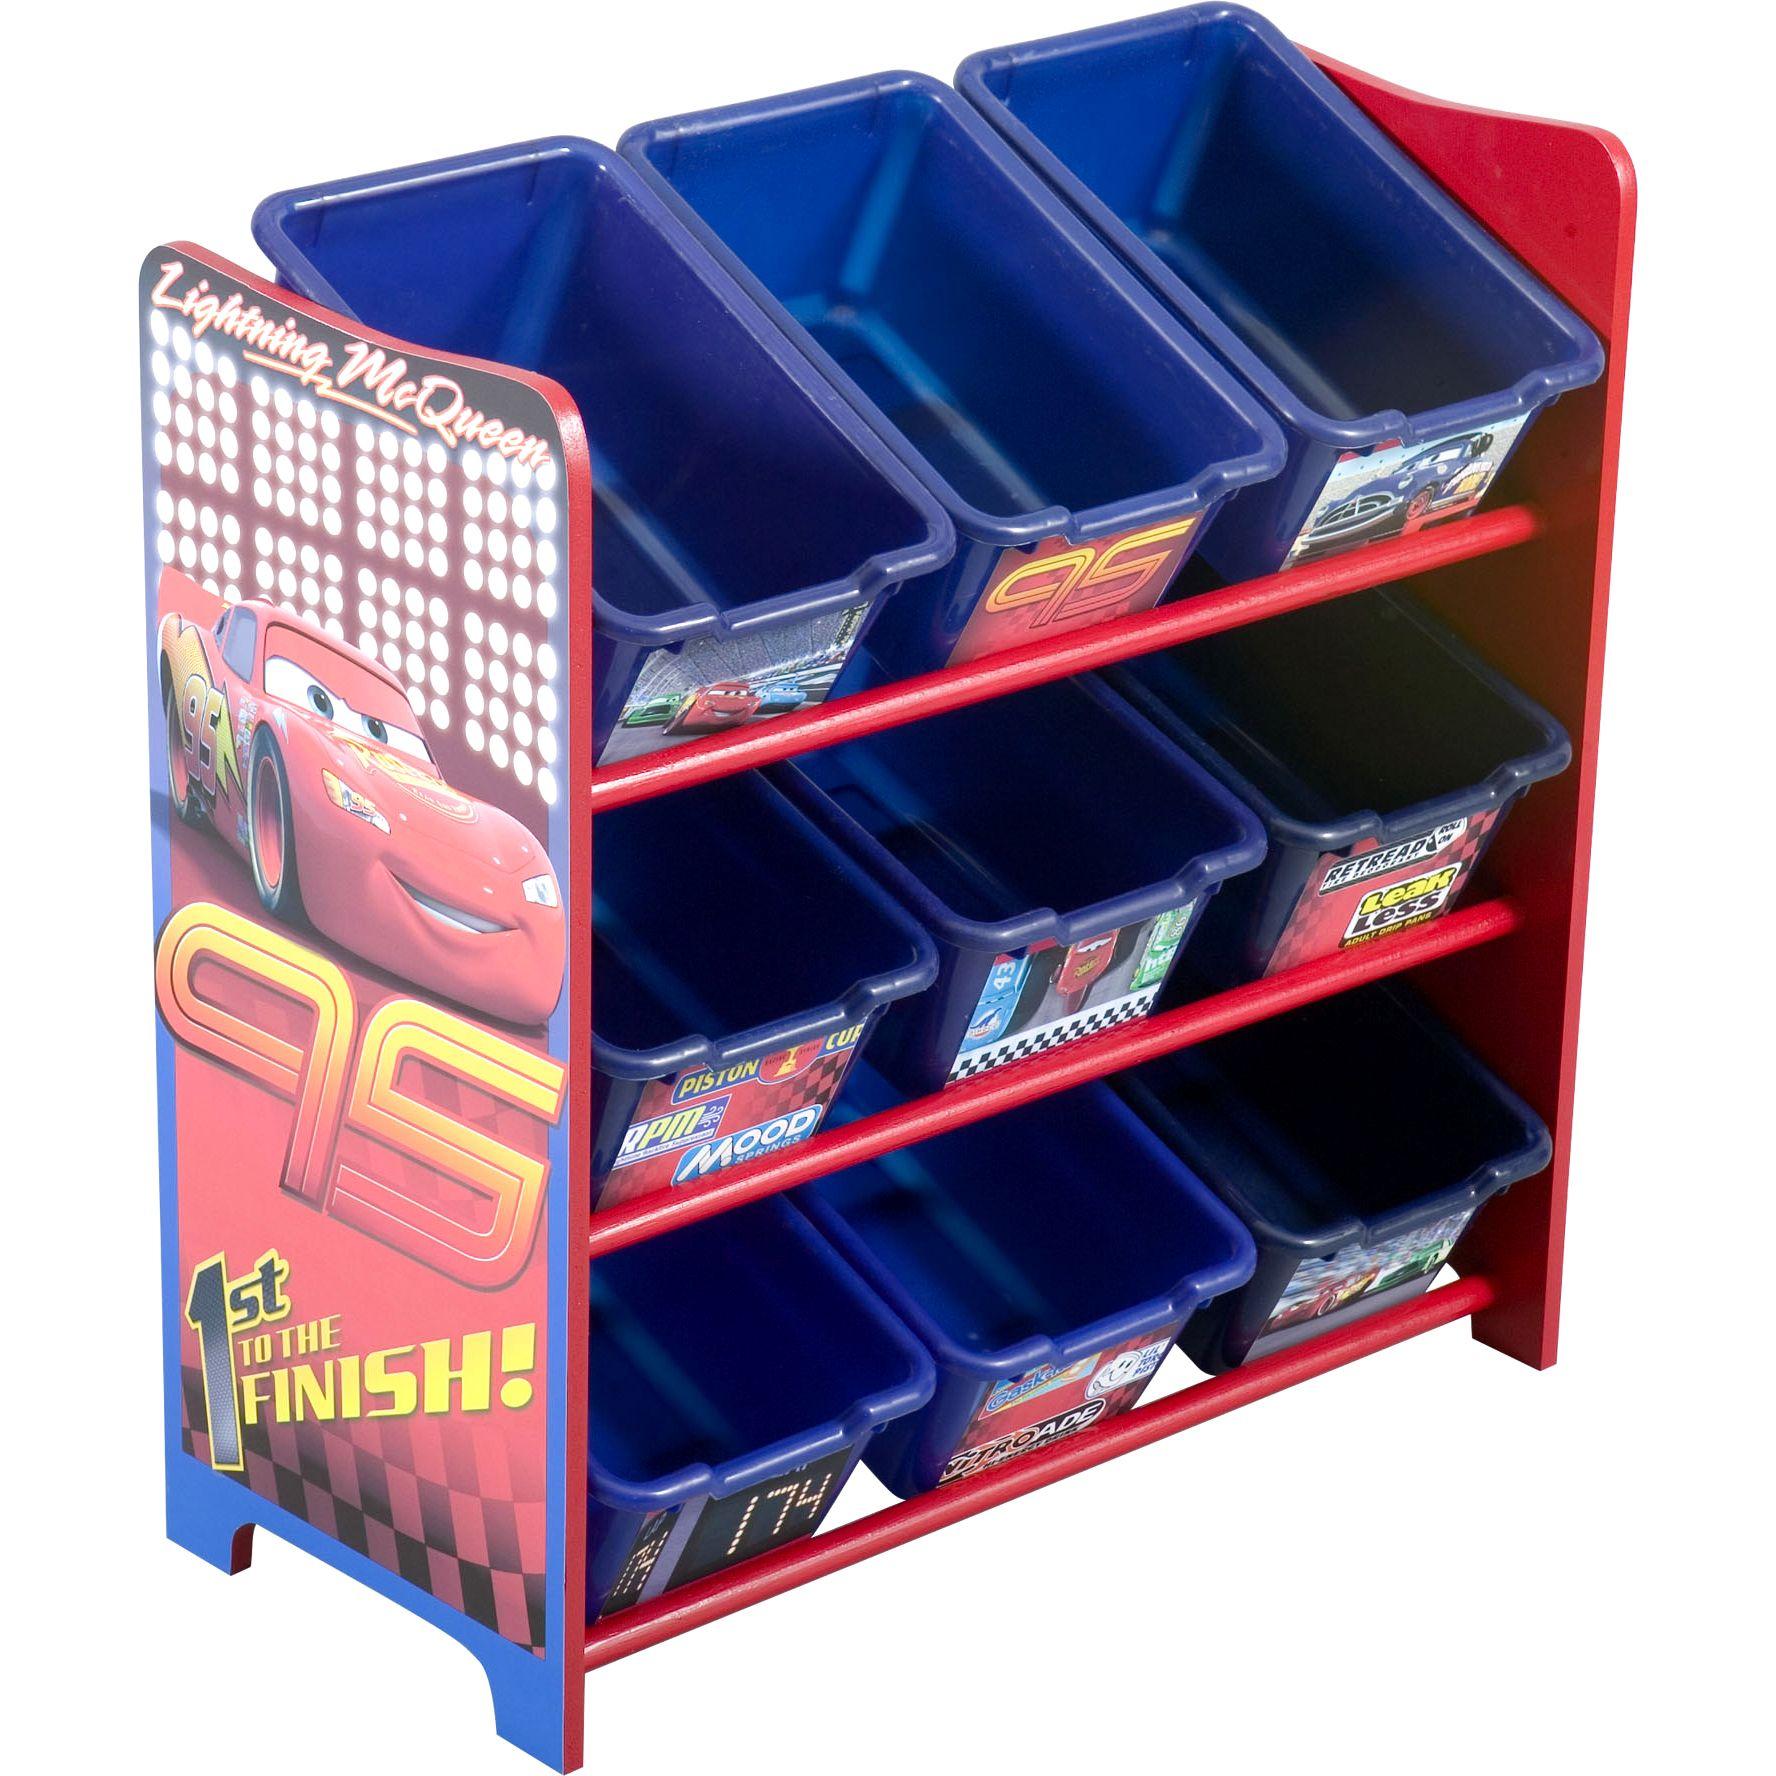 2019 New Wardrobe Kids Organizer Bins Box For Toys: Disney Pixar Cars 9 Bin Toy Organizer